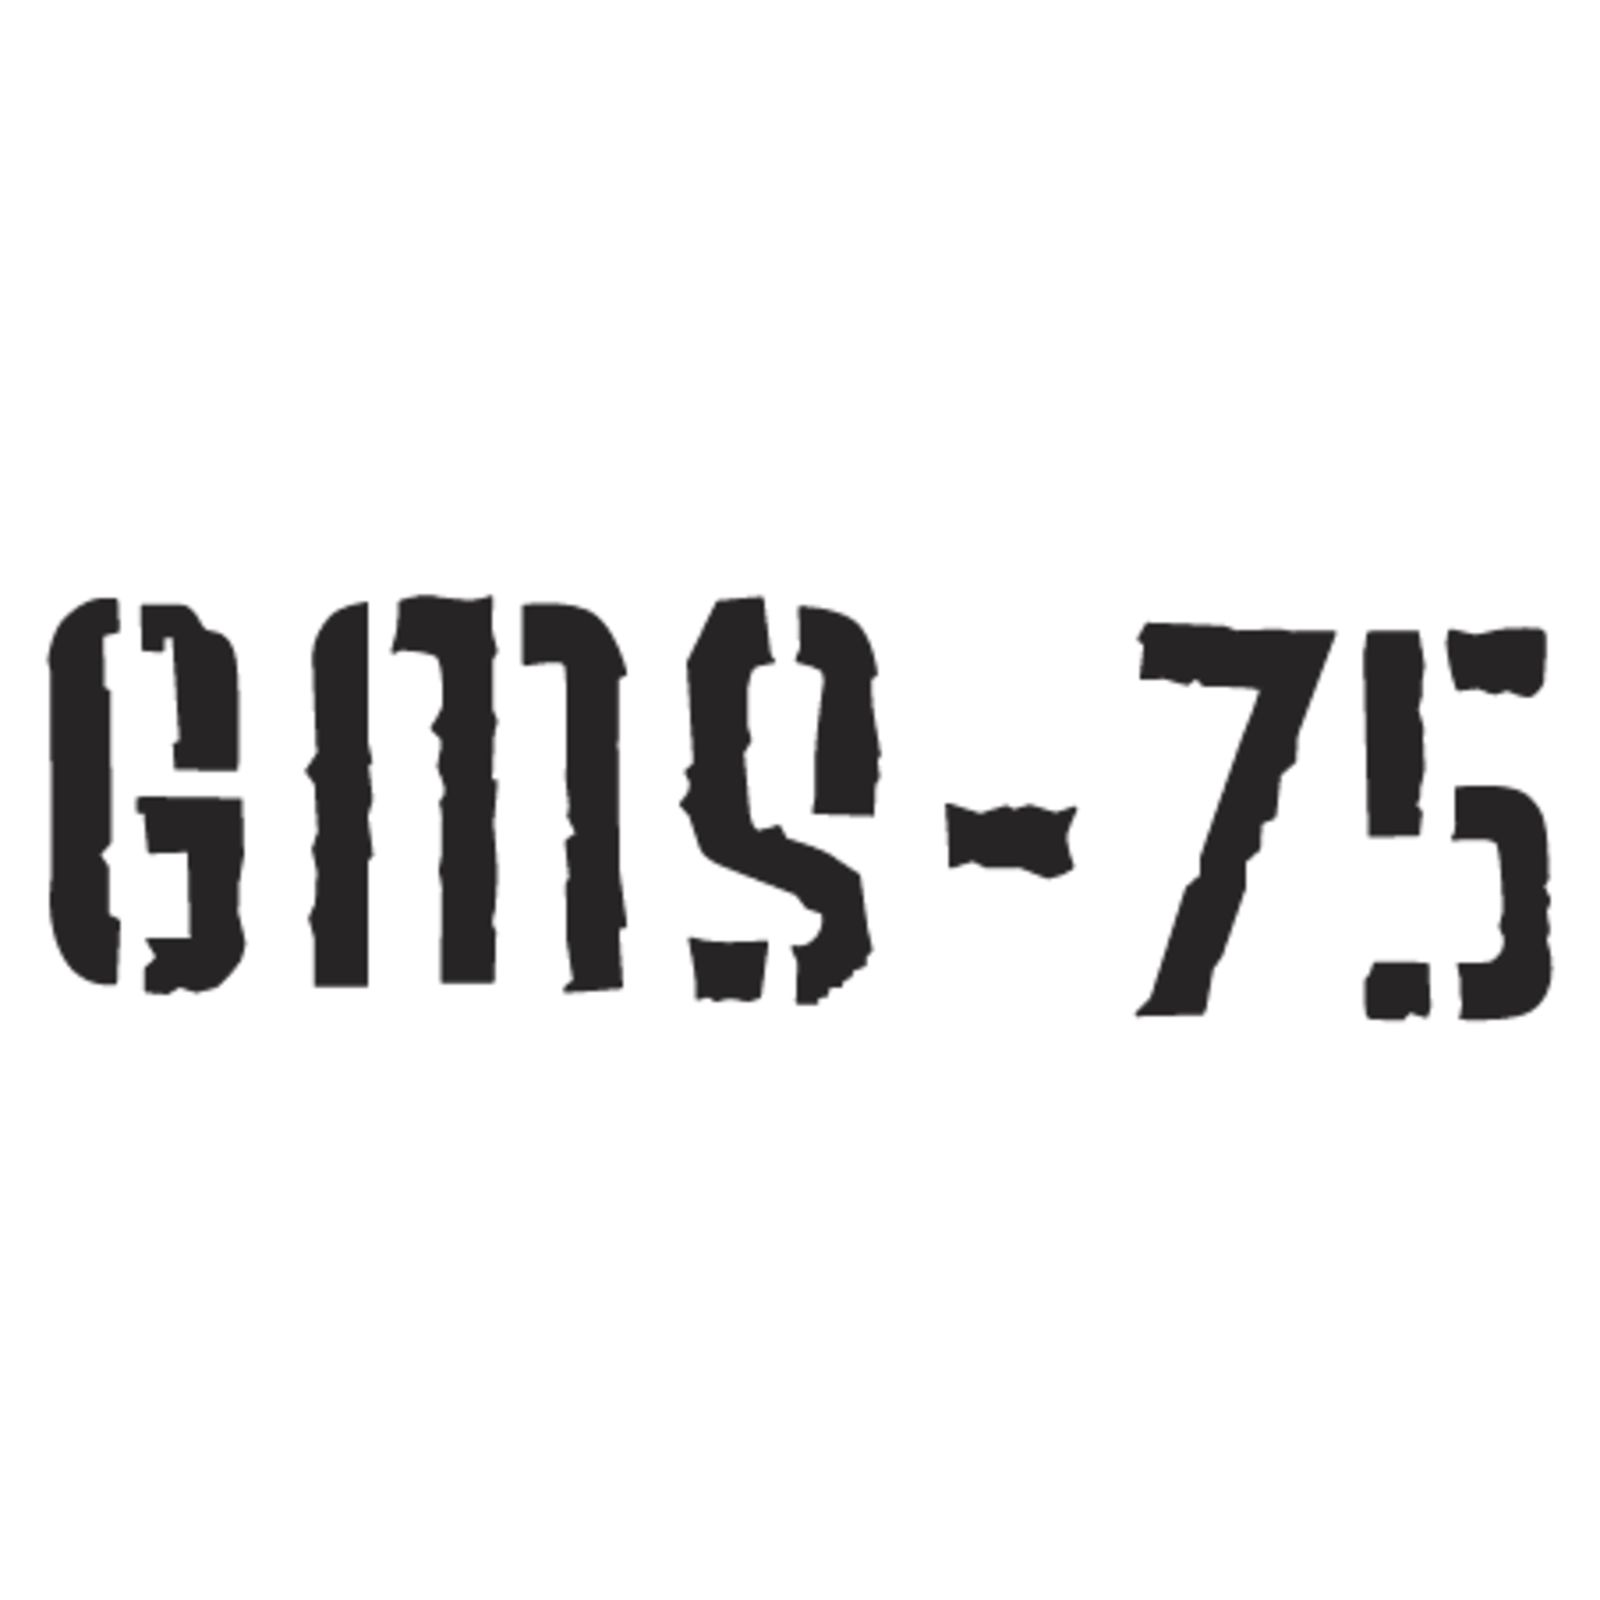 GMS-75 (Image 1)